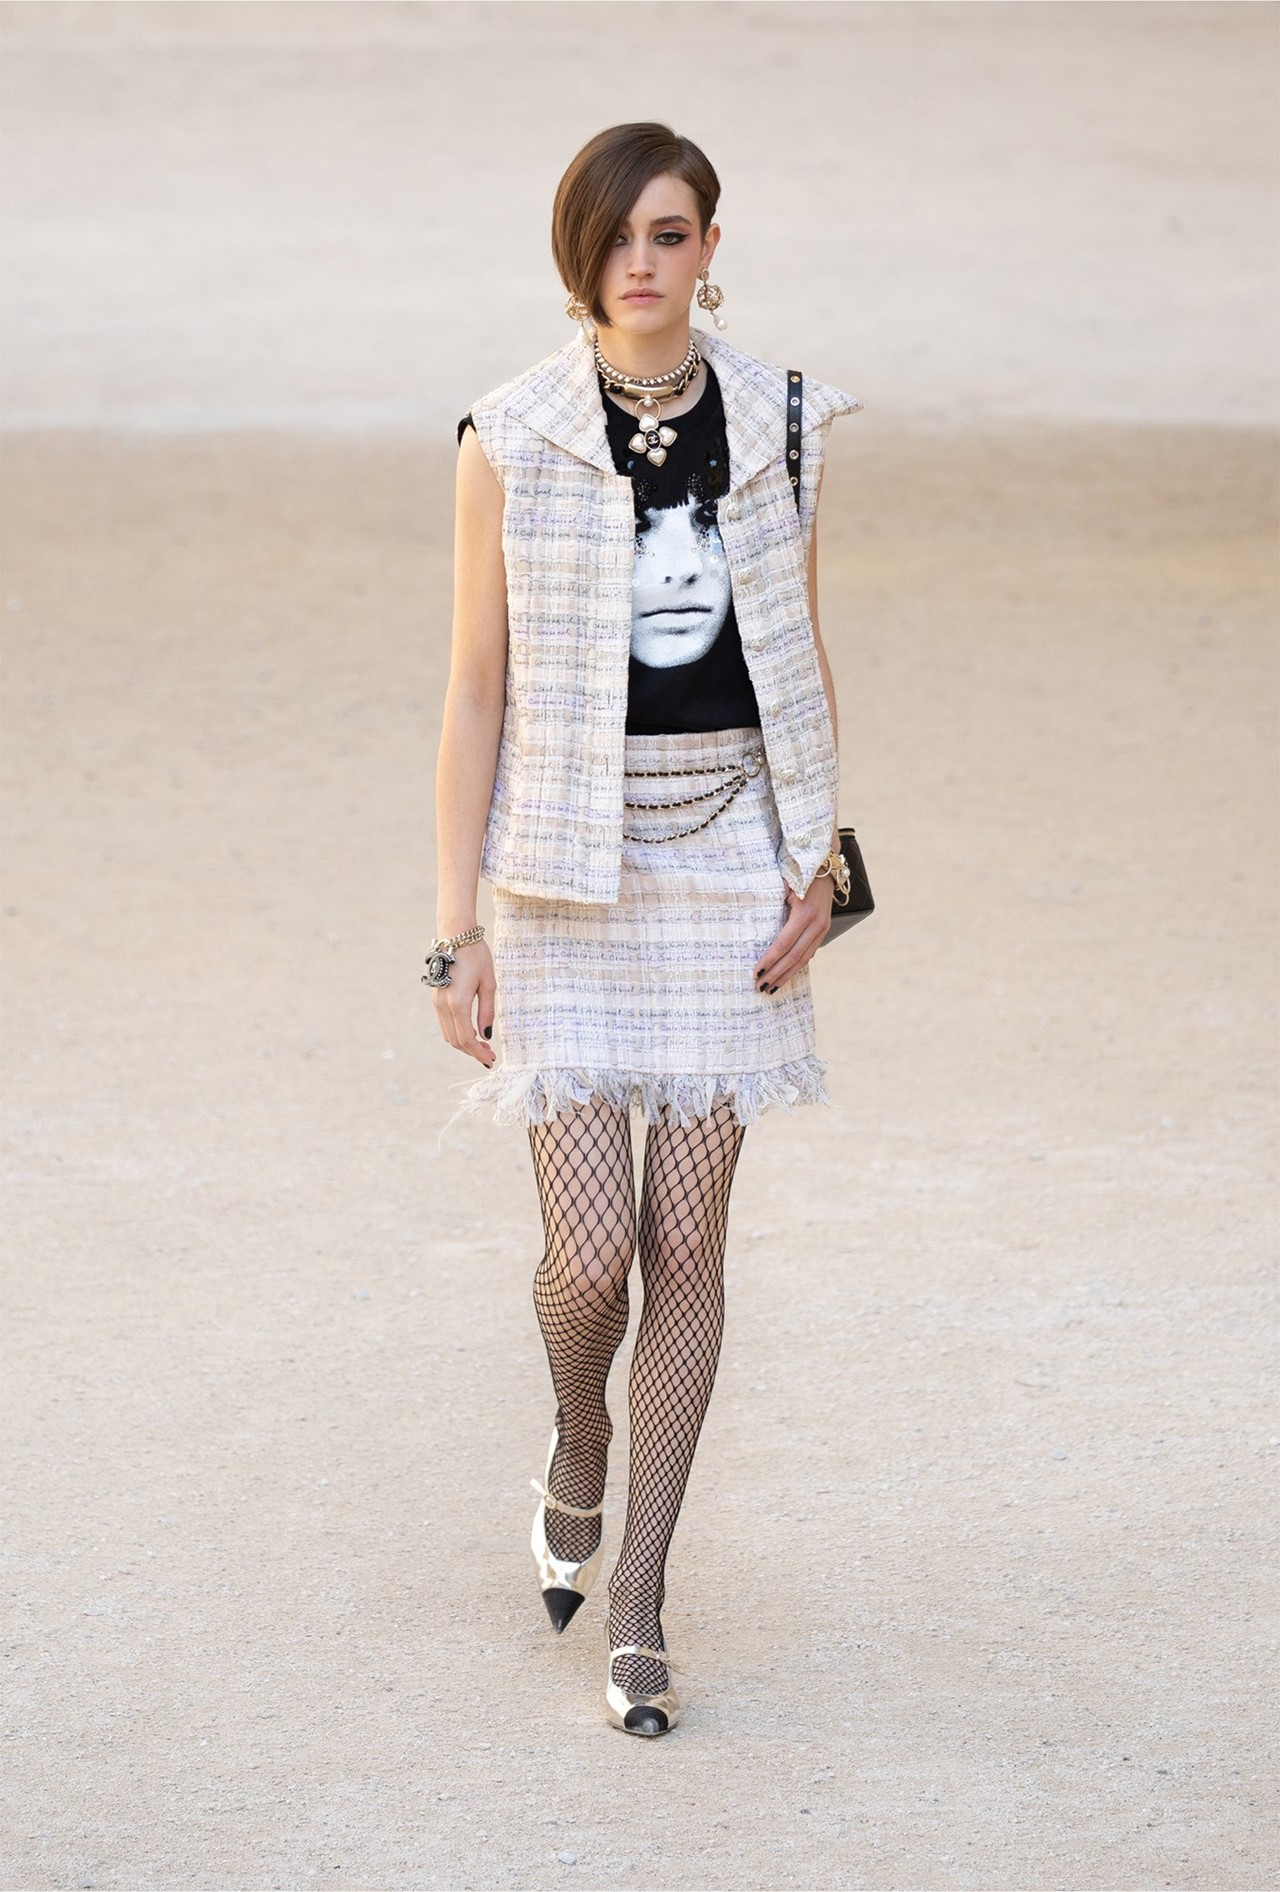 Chanel_Cruise_2022_Fashionela (18)